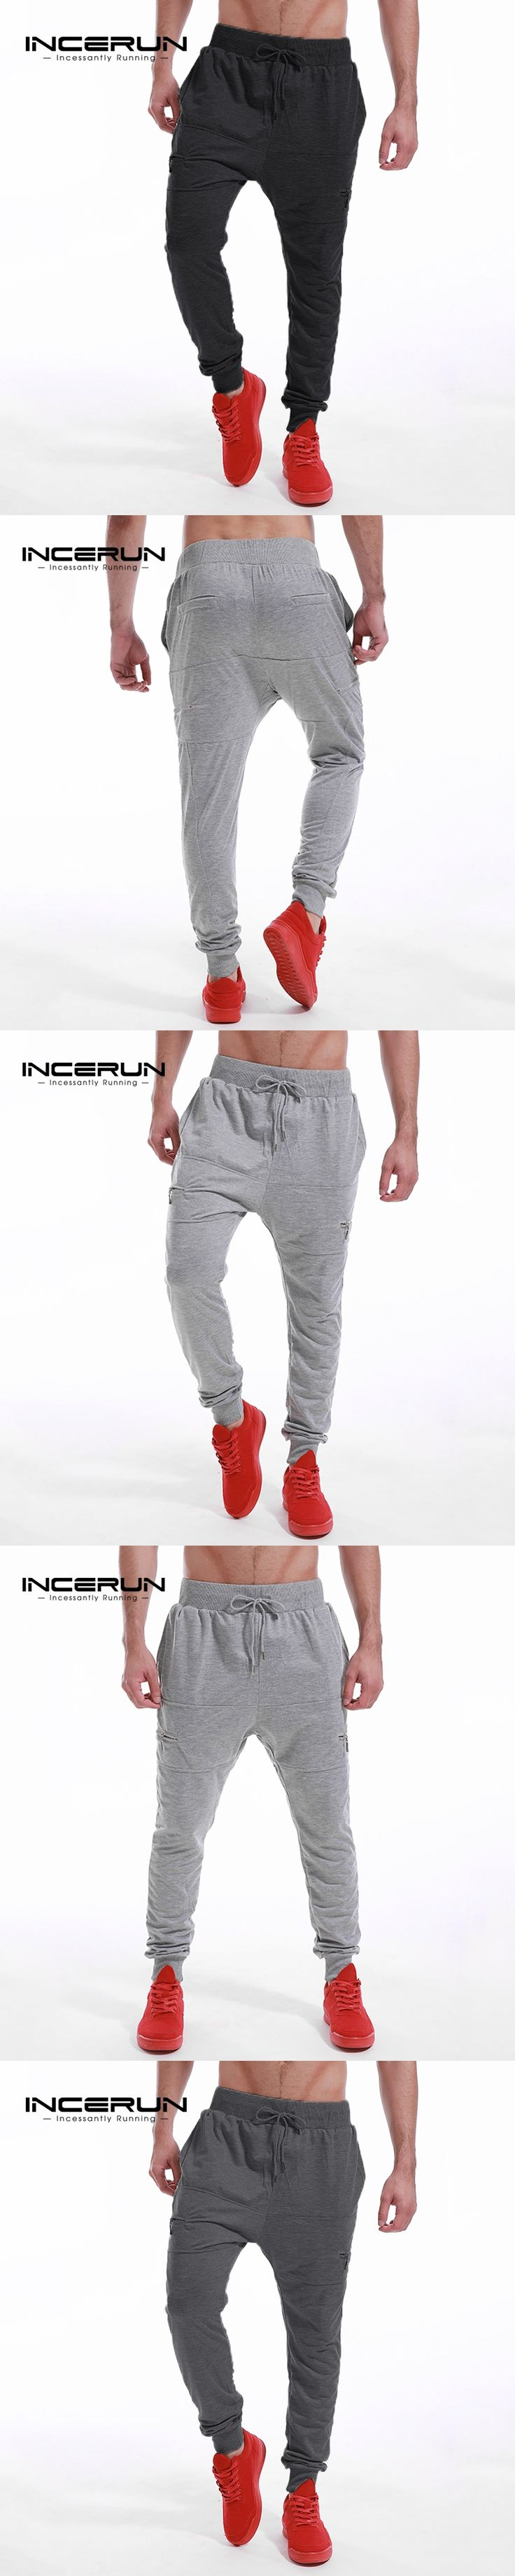 Men's Skinny Sweatpants 2017 Casual Joggers Elastic Waist Fitness Workout Sweats Pants Gyms Tracksuit Bottoms Men Harem Trousers